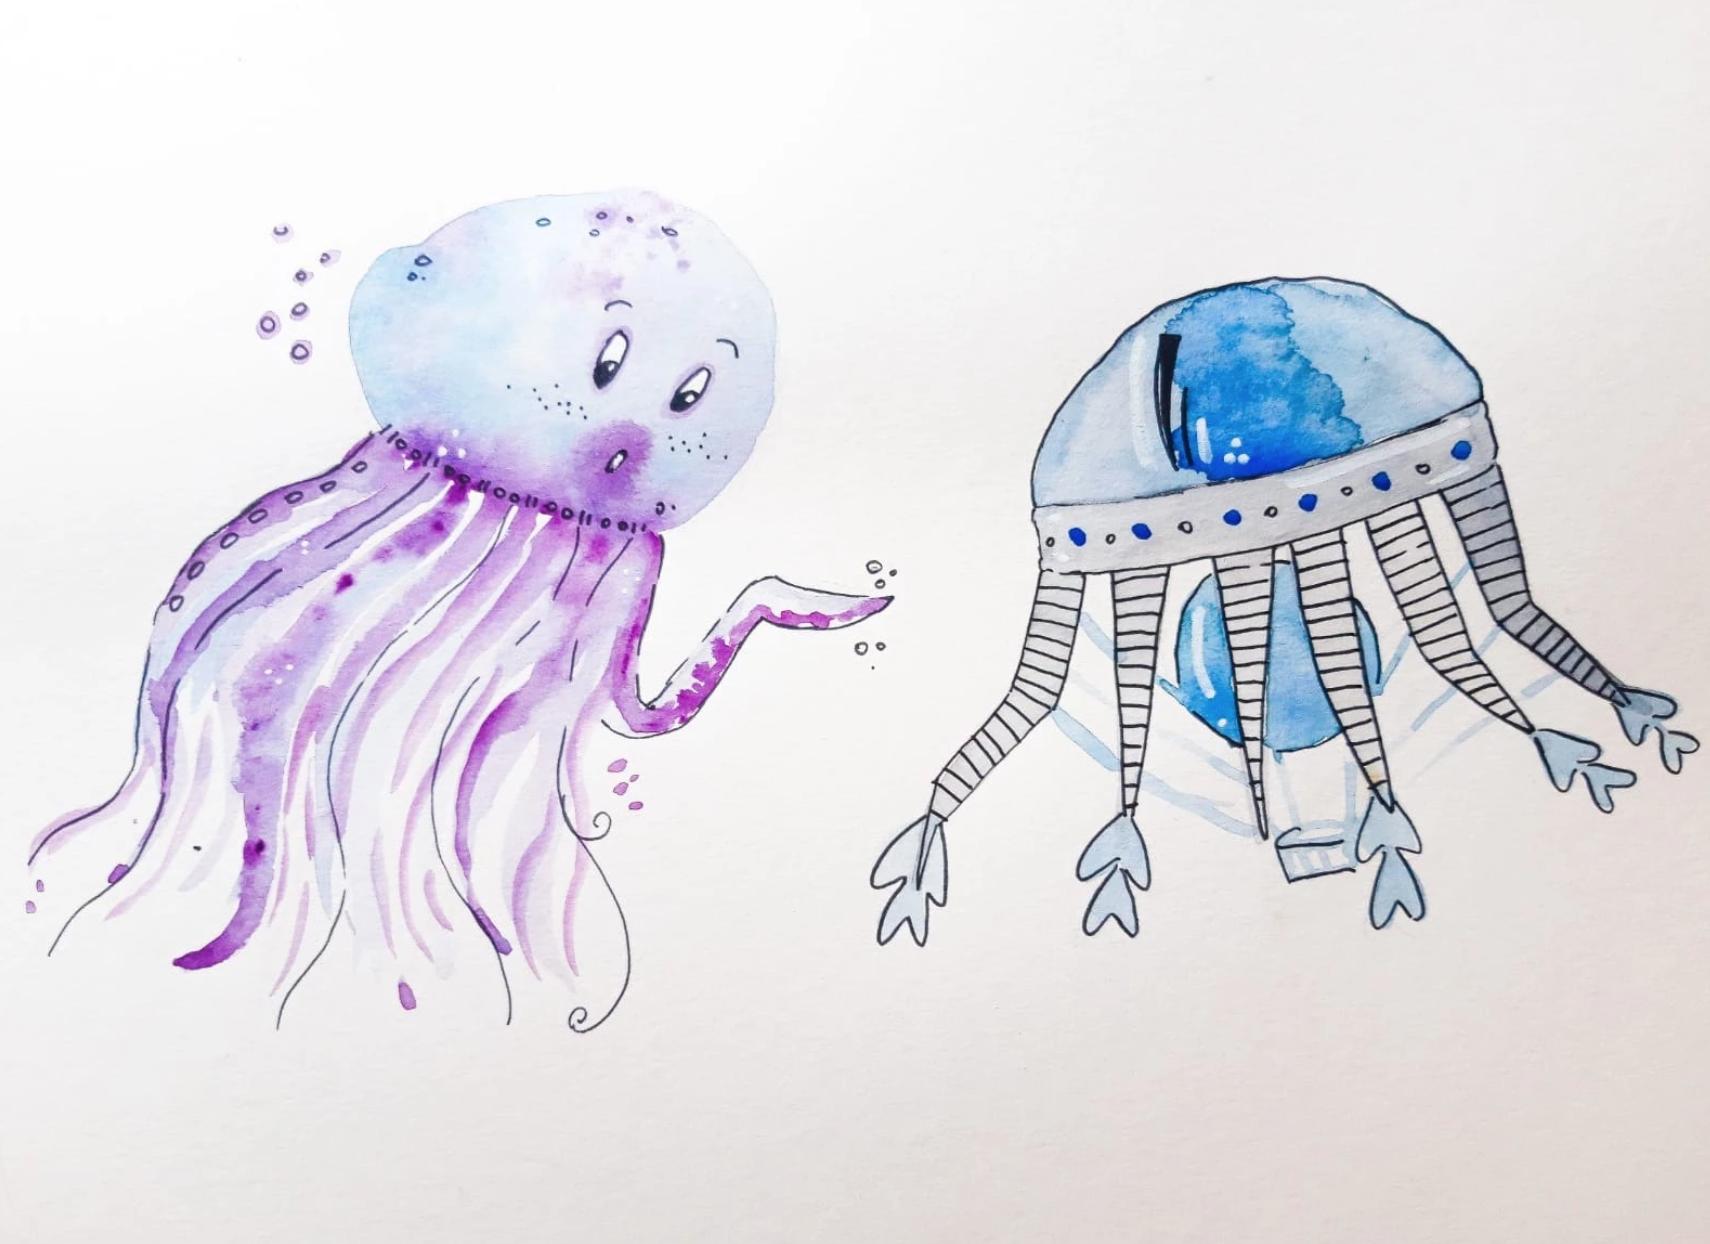 medusa robot_Giovanna Mancusi